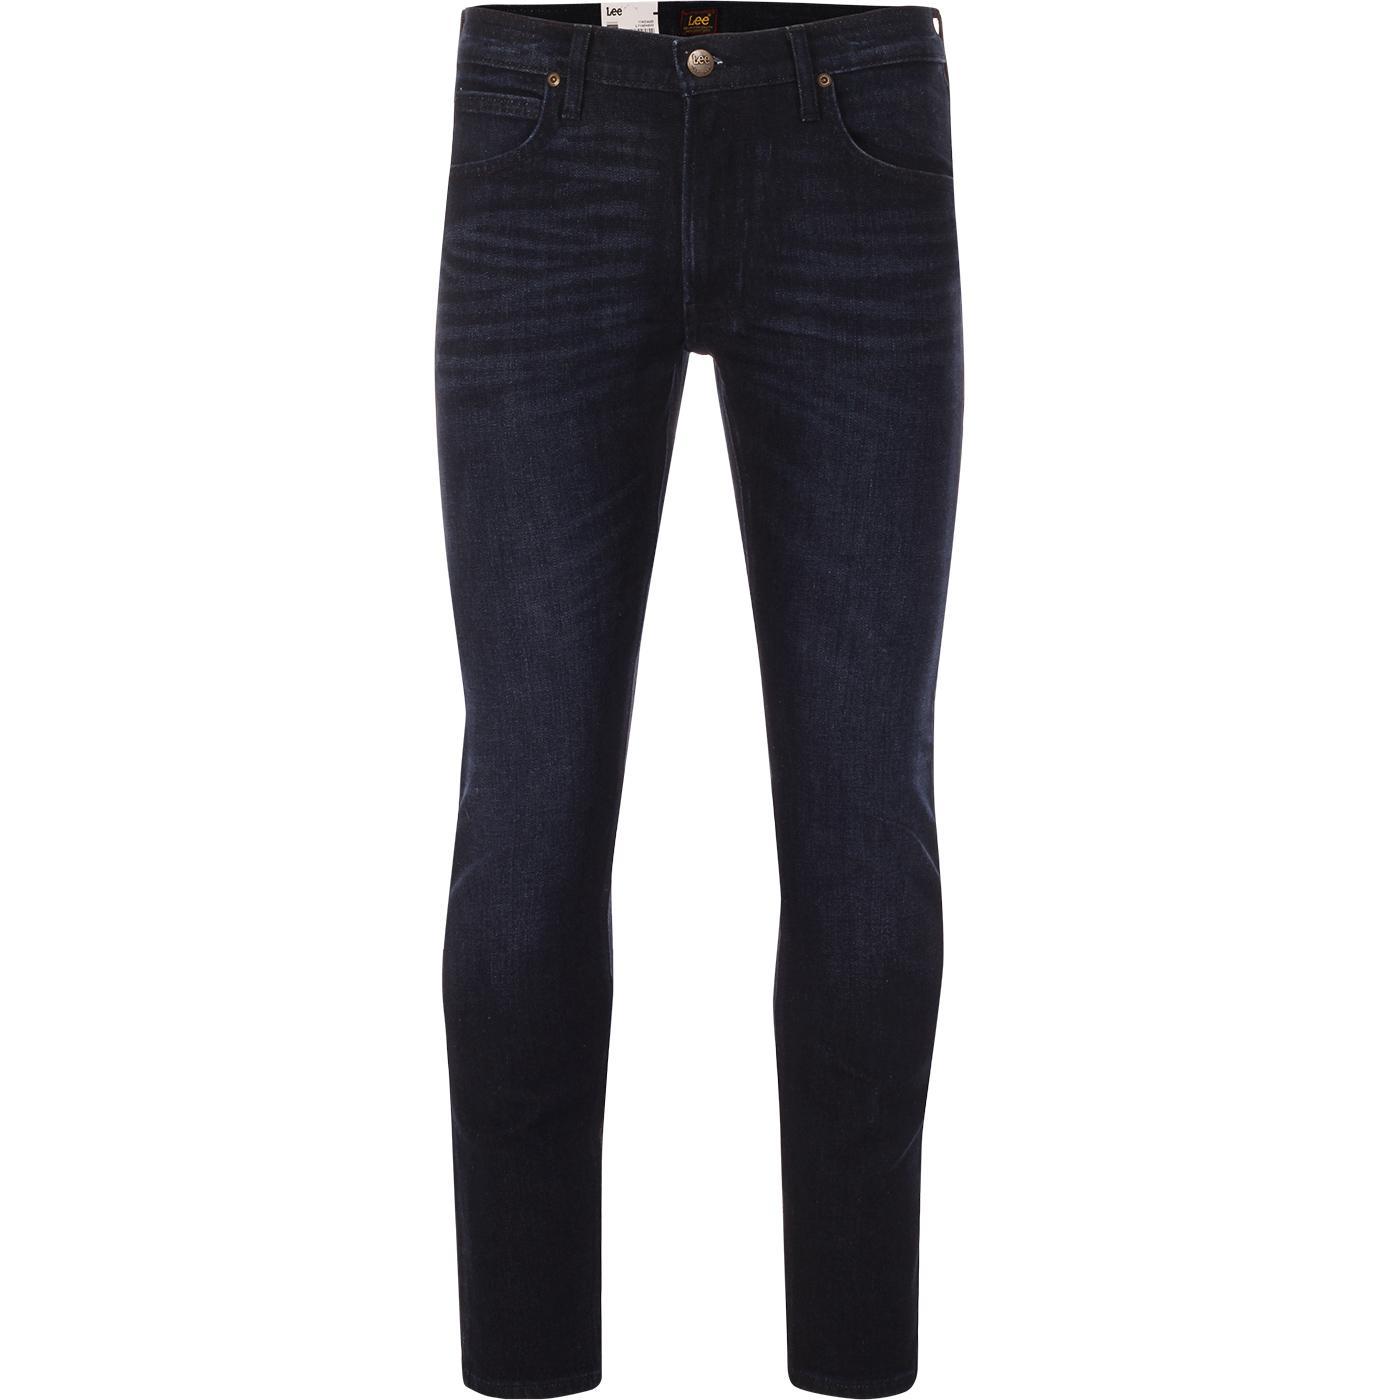 Luke LEE JEANS Slim Tapered Jeans DARK TONAL PARK